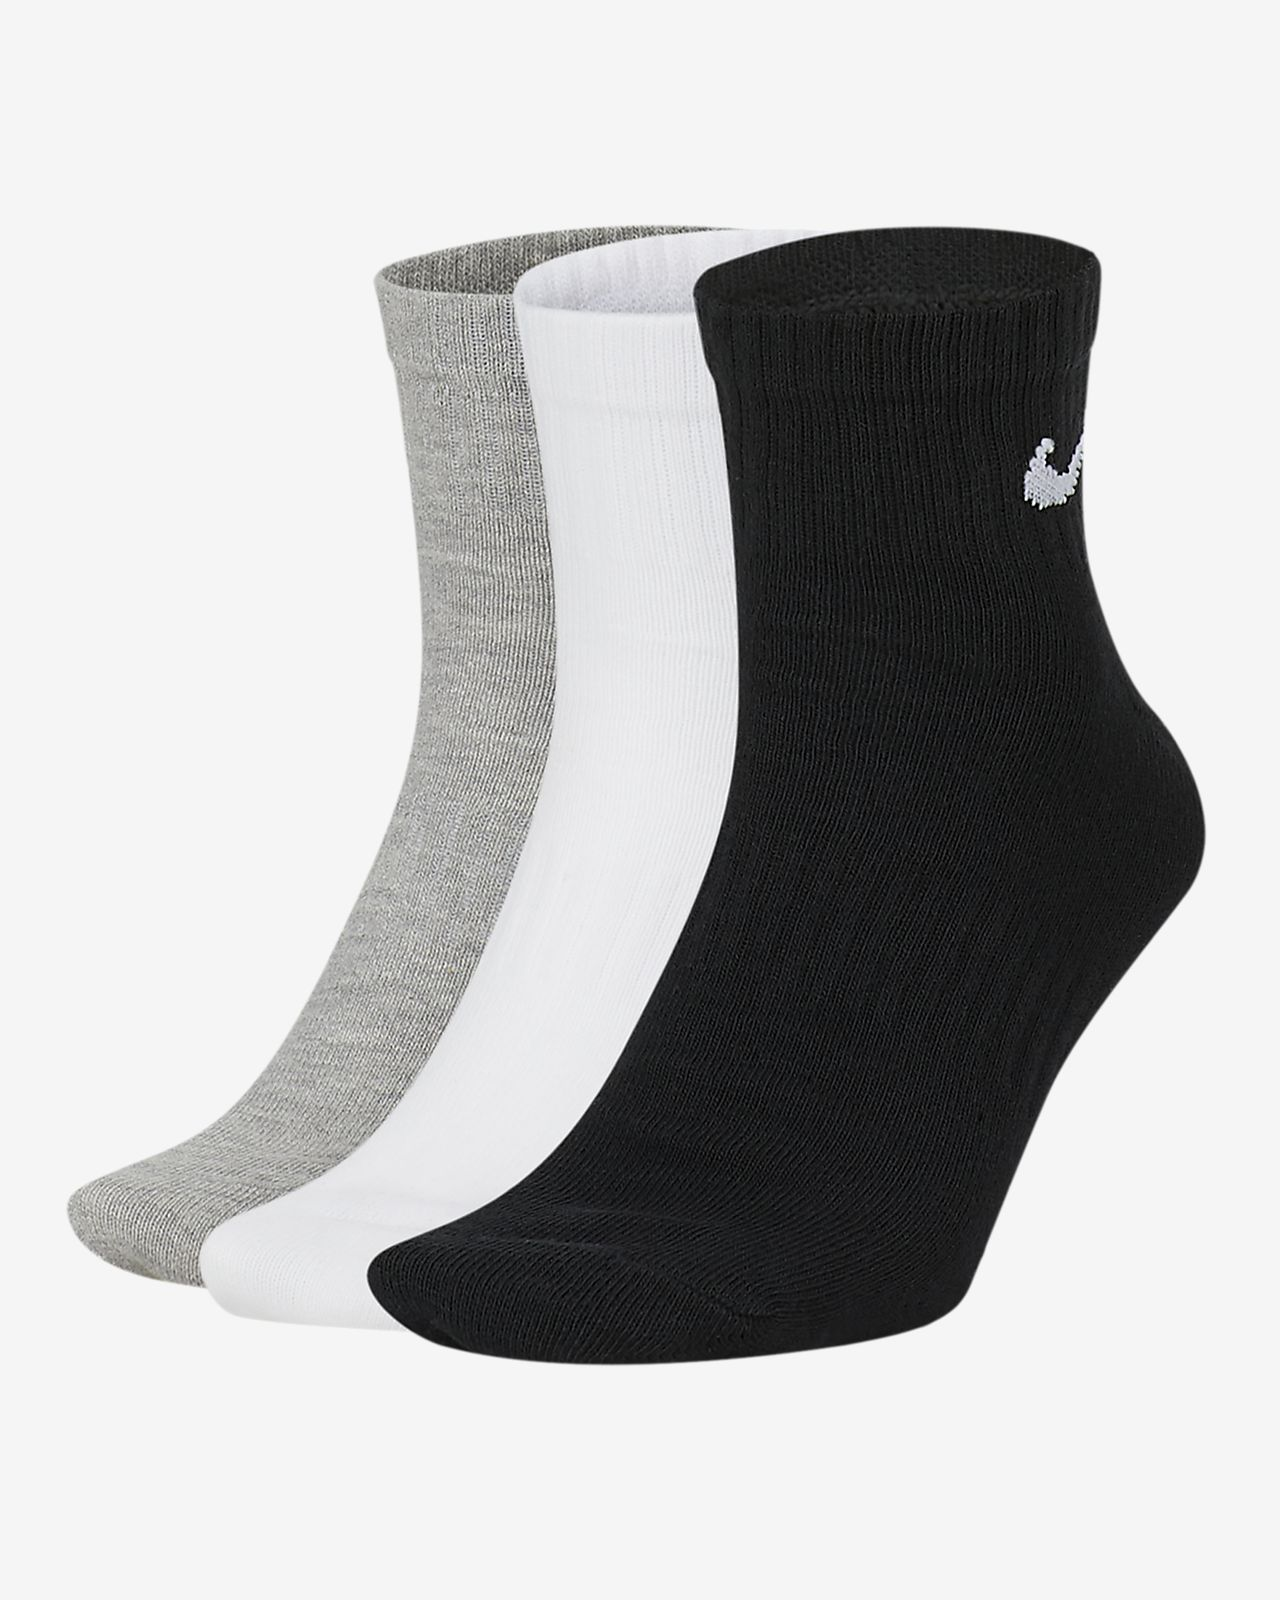 Calcetines de entrenamiento Nike Everyday Lightweight Ankle (3 pares)